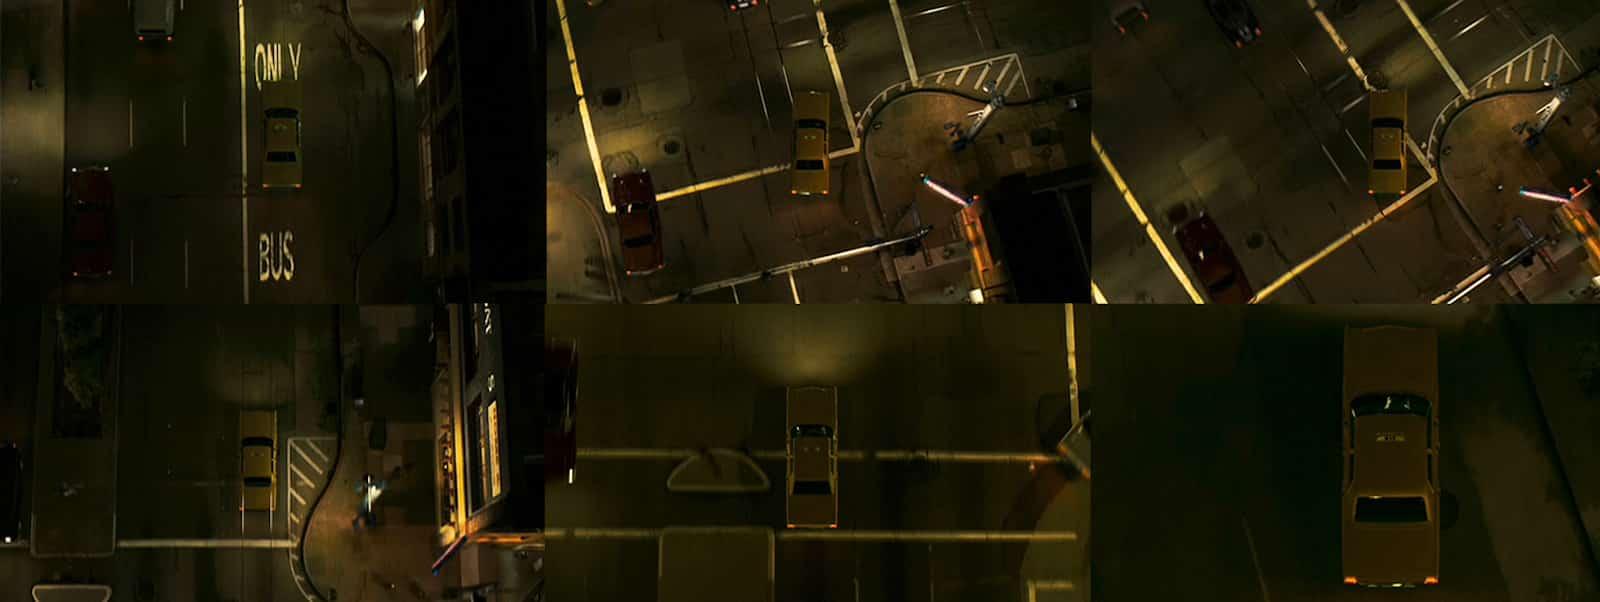 Aerial Shot - Camera Angles - Zodiac gods eye view